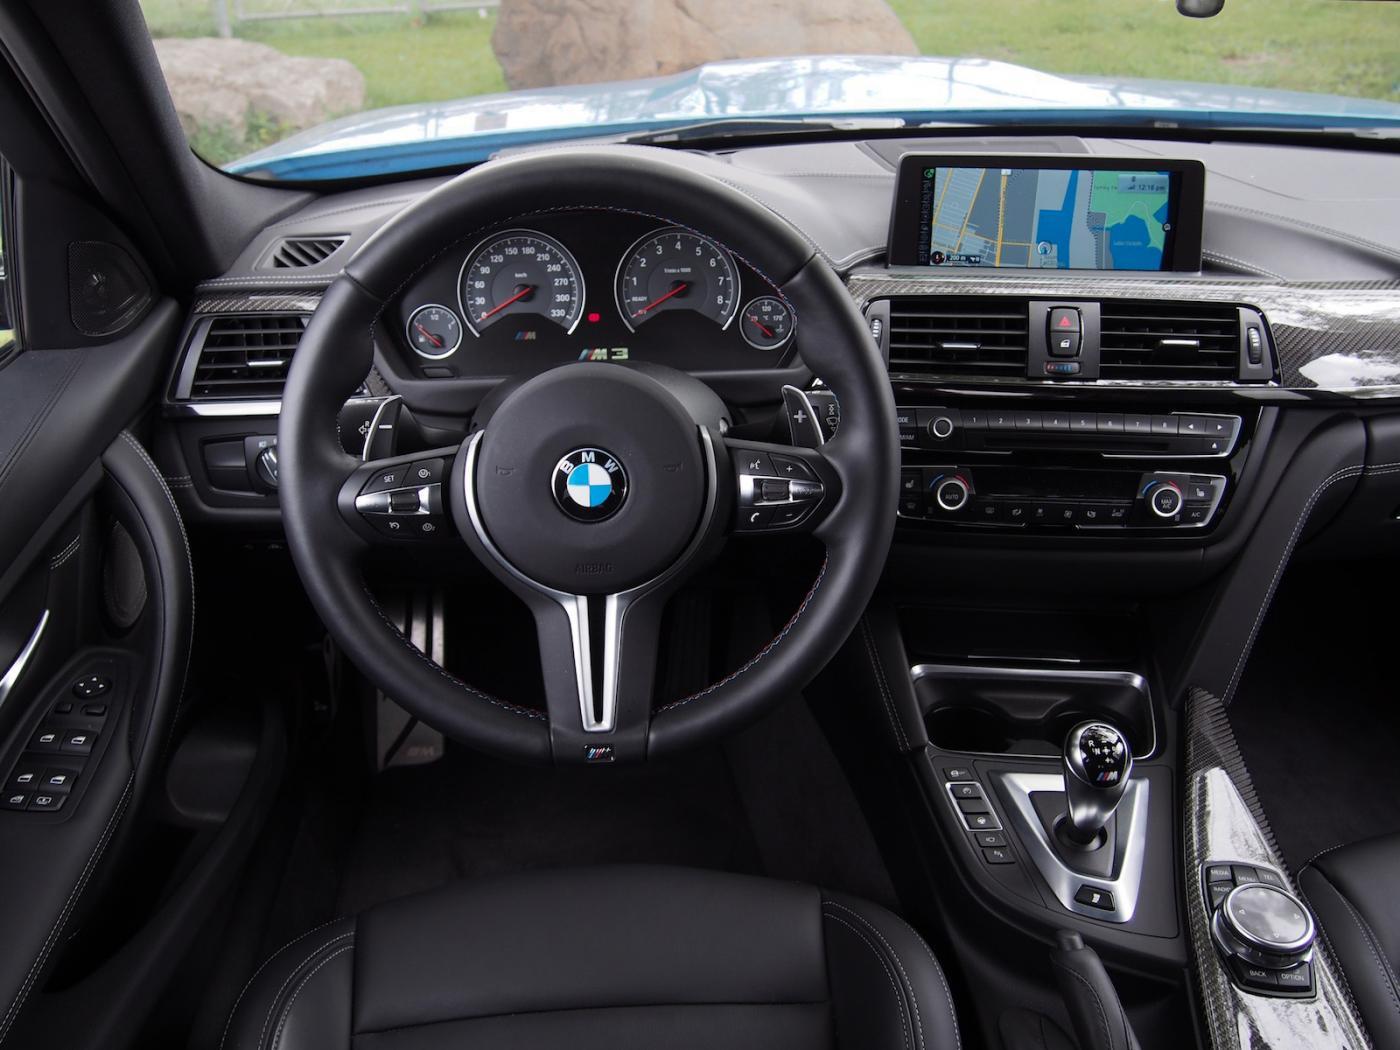 BMW-M3-F80-6.jpeg